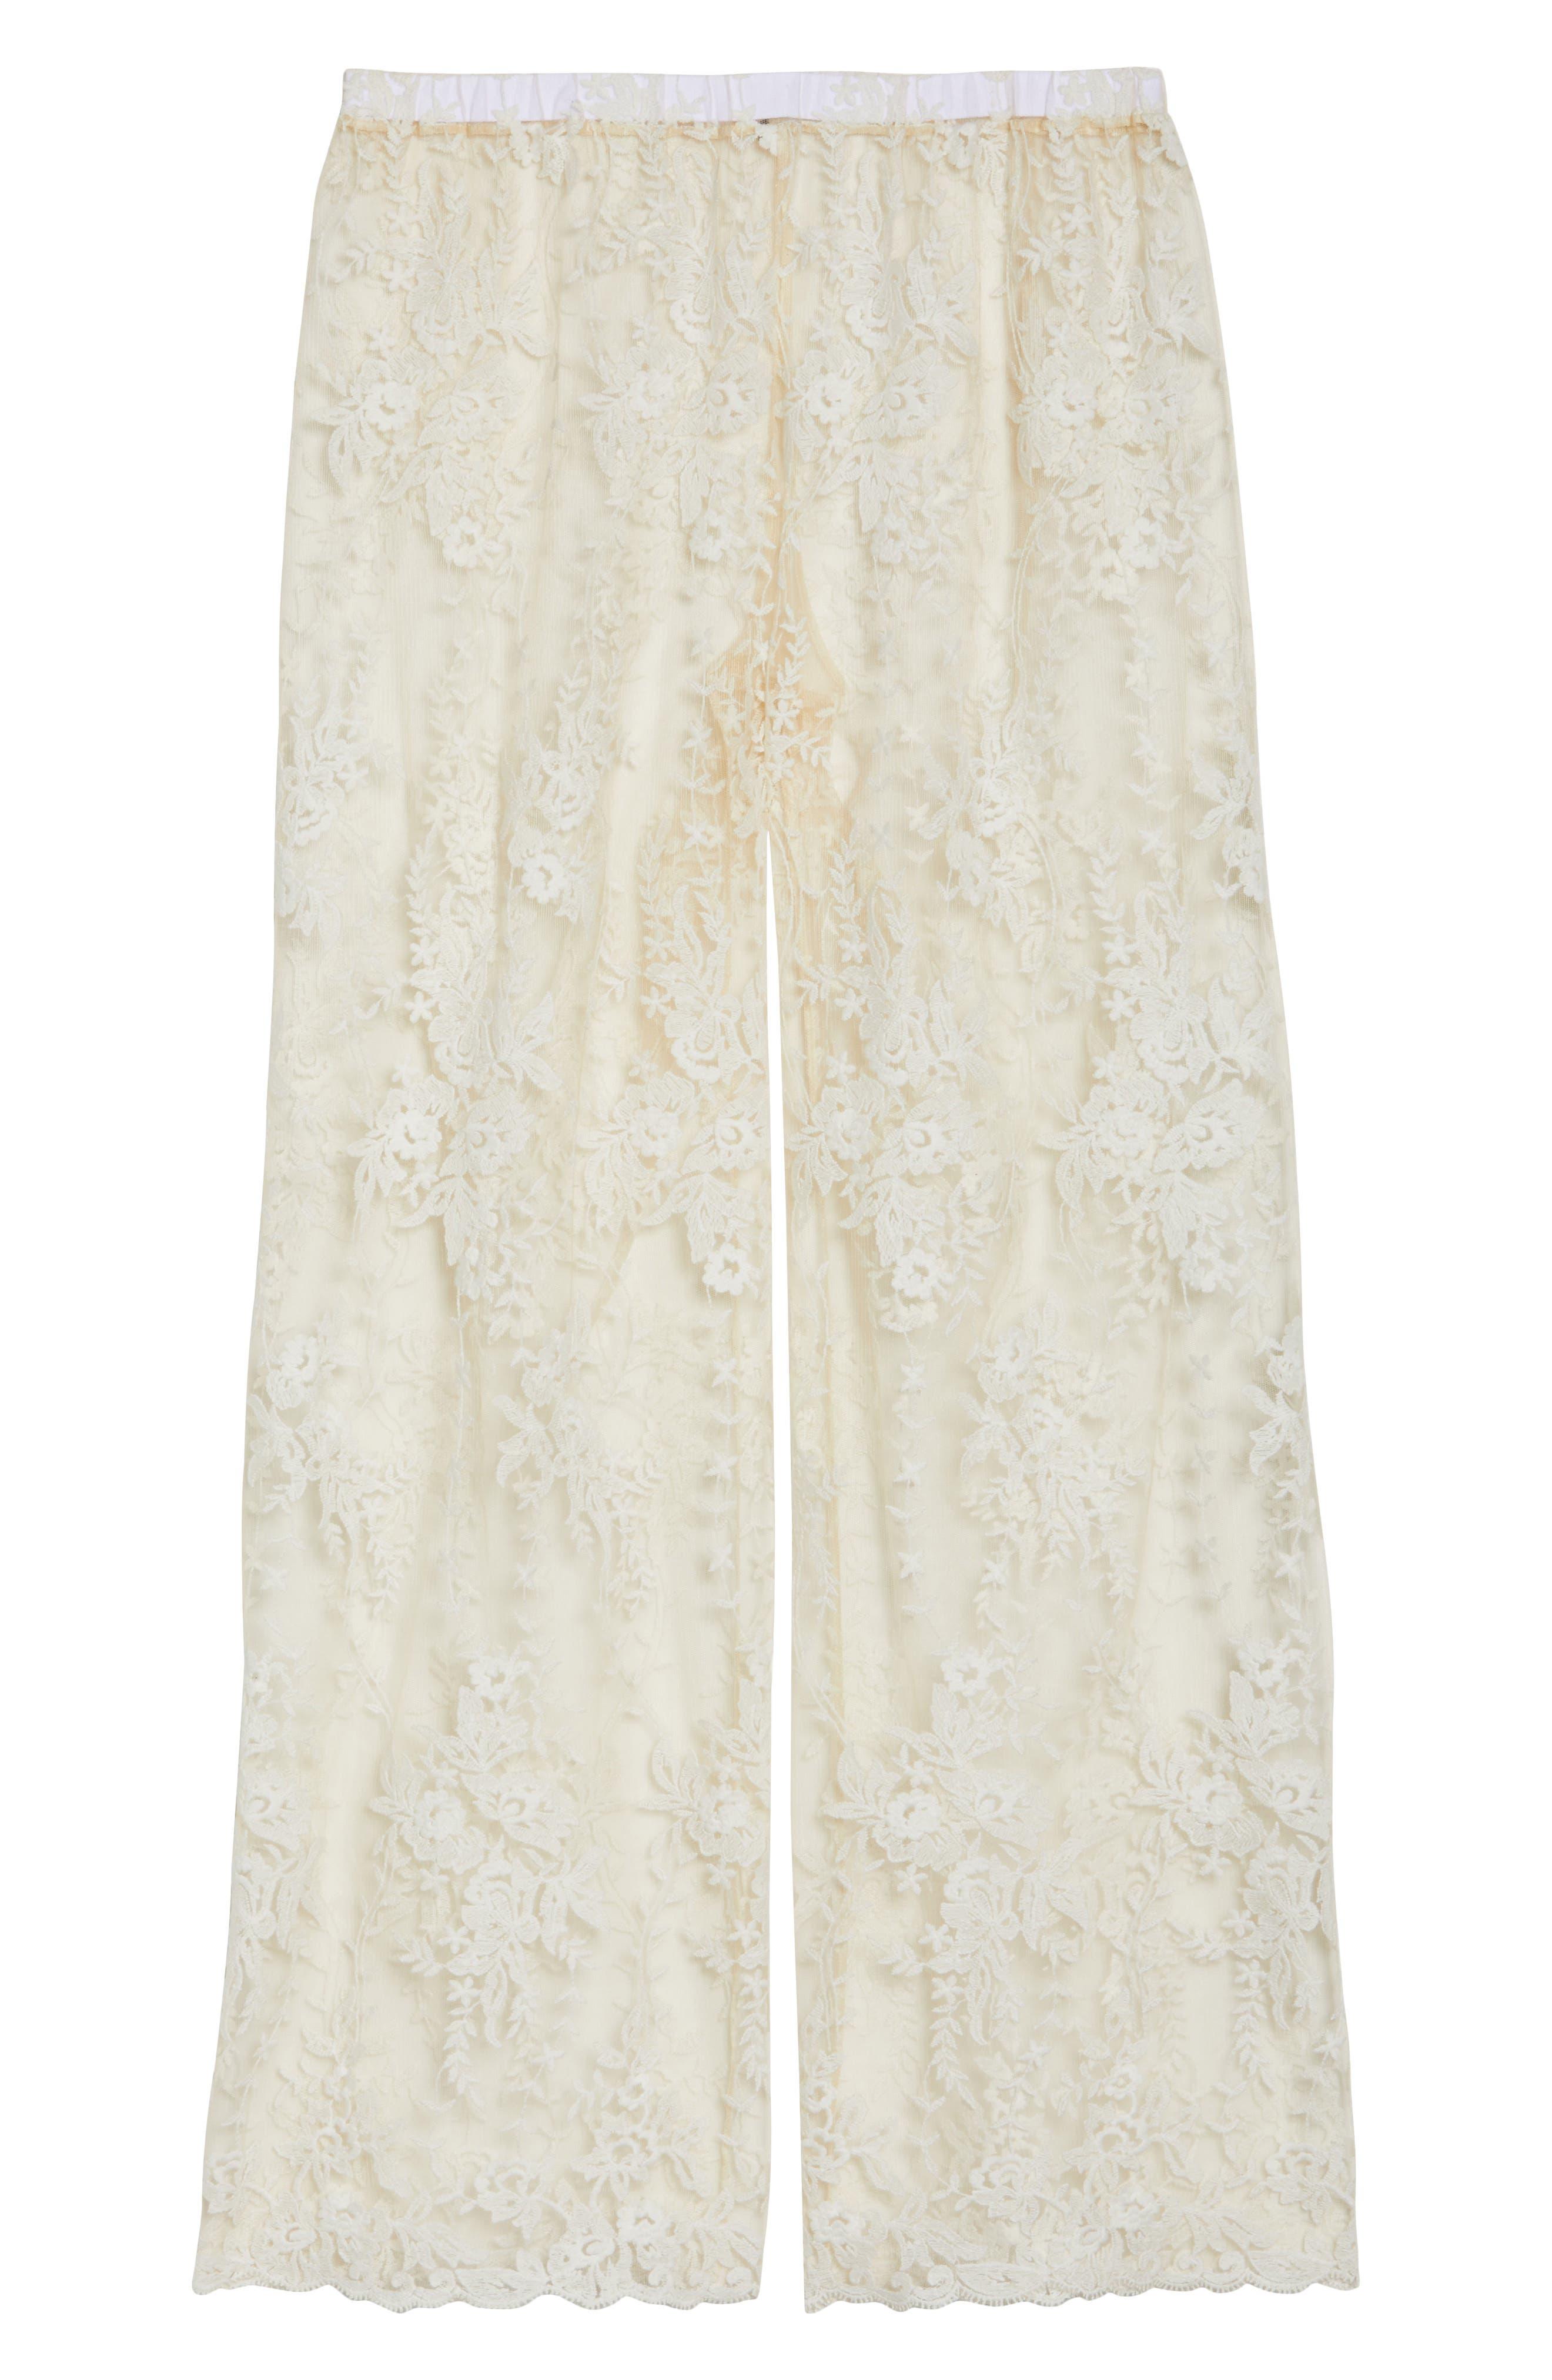 Rosie Pants,                             Alternate thumbnail 4, color,                             Moon Ivory